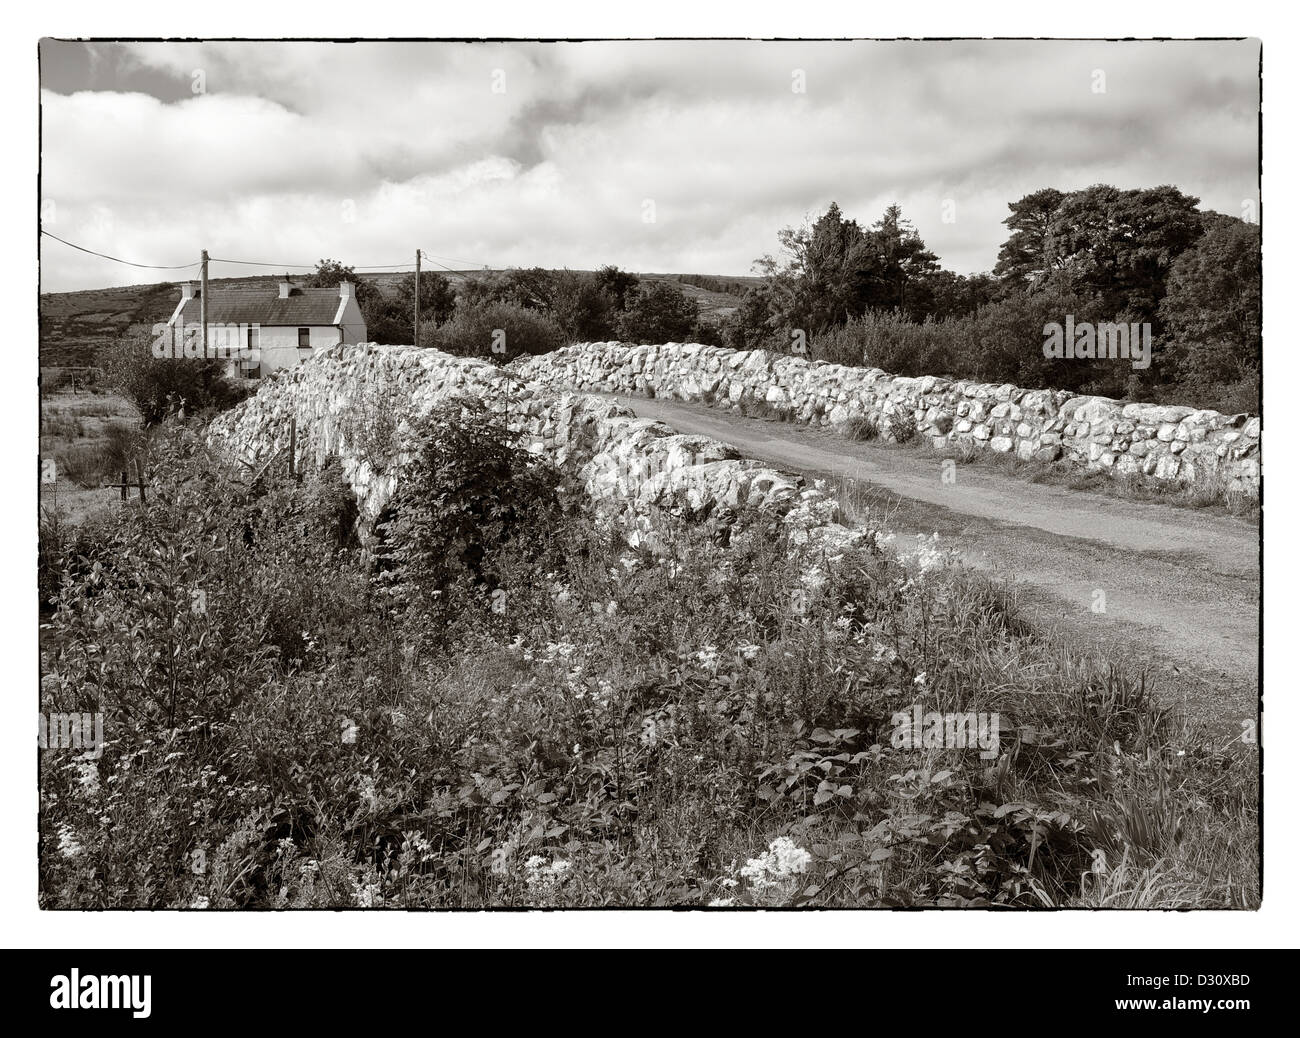 The Quiet Man Bridge in County Galway, Ireland. The historic stone bridge featured in the 1950s film, 'The Quiet - Stock Image